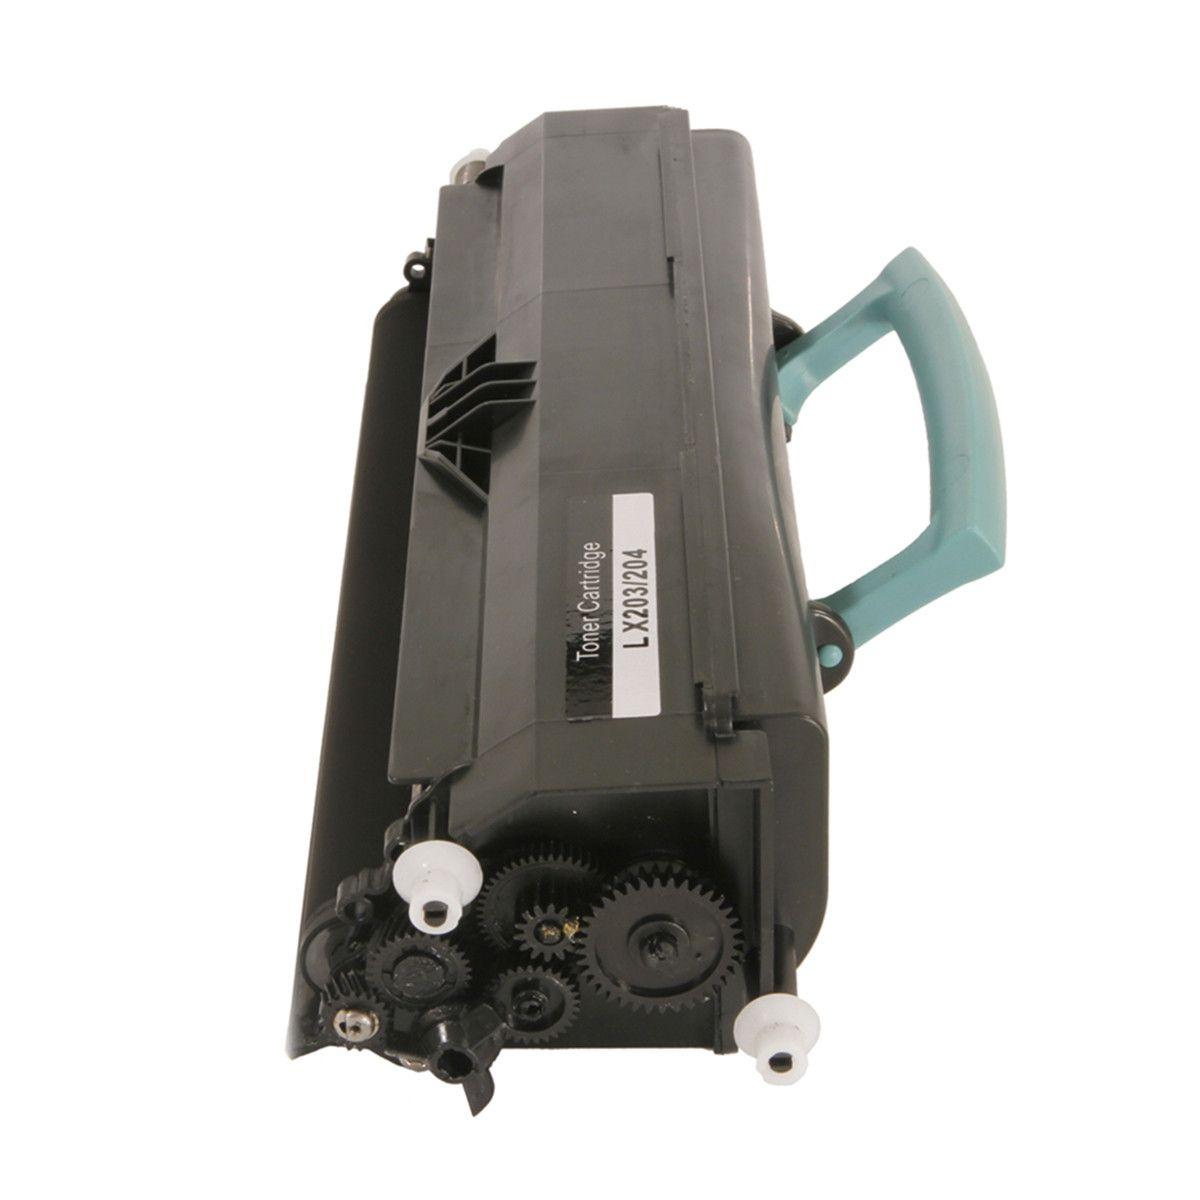 Toner compatível com Lexmark X203 X204 X204N X203N X203A11G Black 2.500 Páginas - Cartucho & Cia